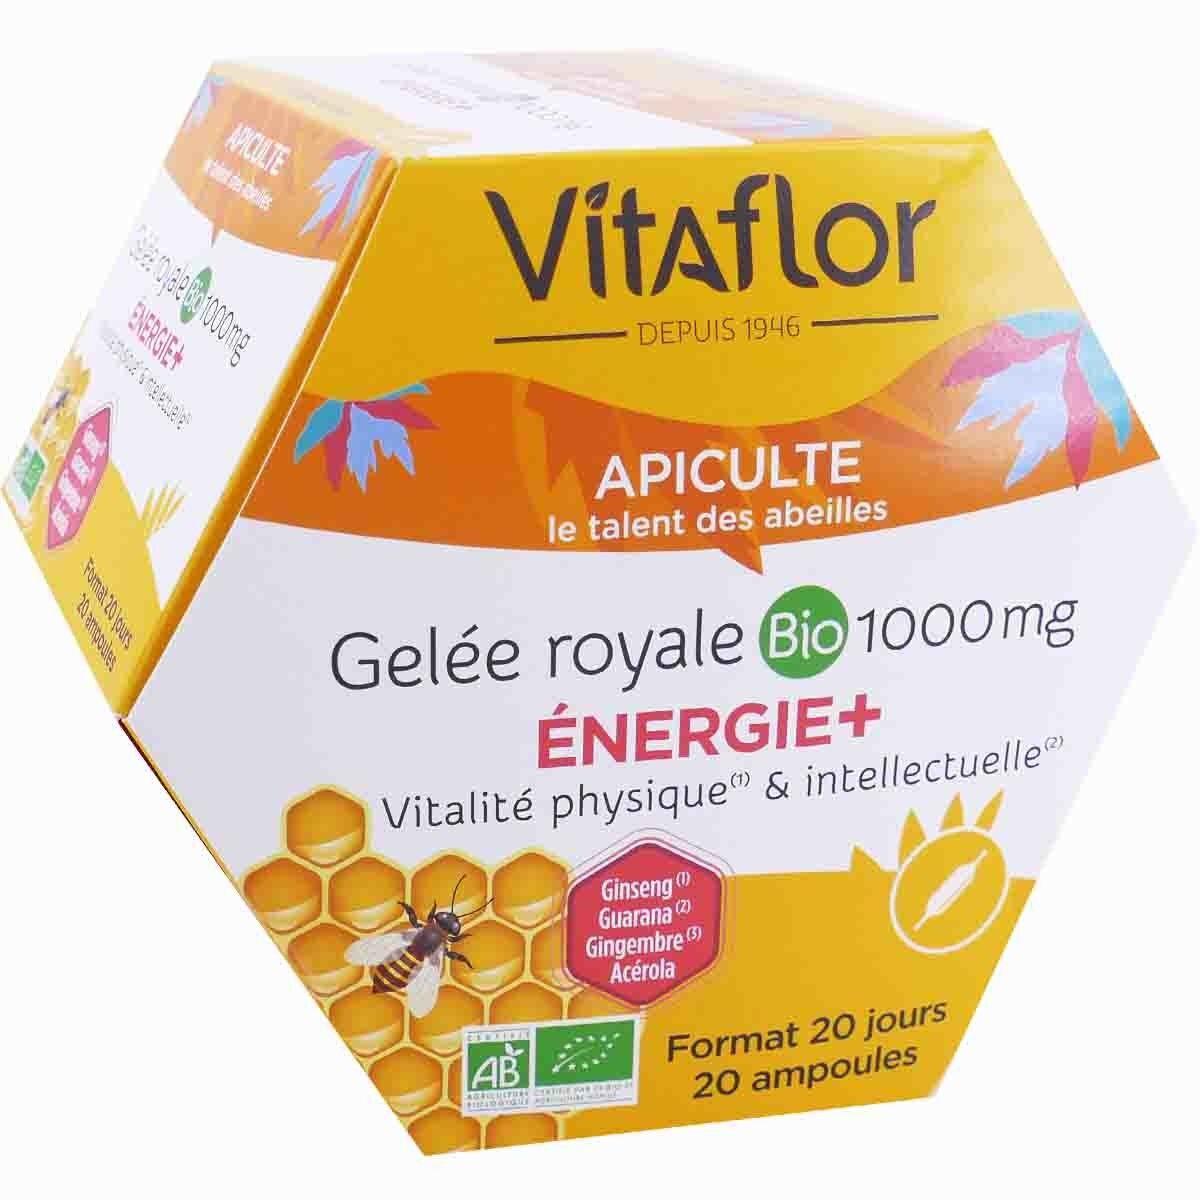 Vitaflor apiculte gelee royale bio 1000mg 20 ampoules 15 ml